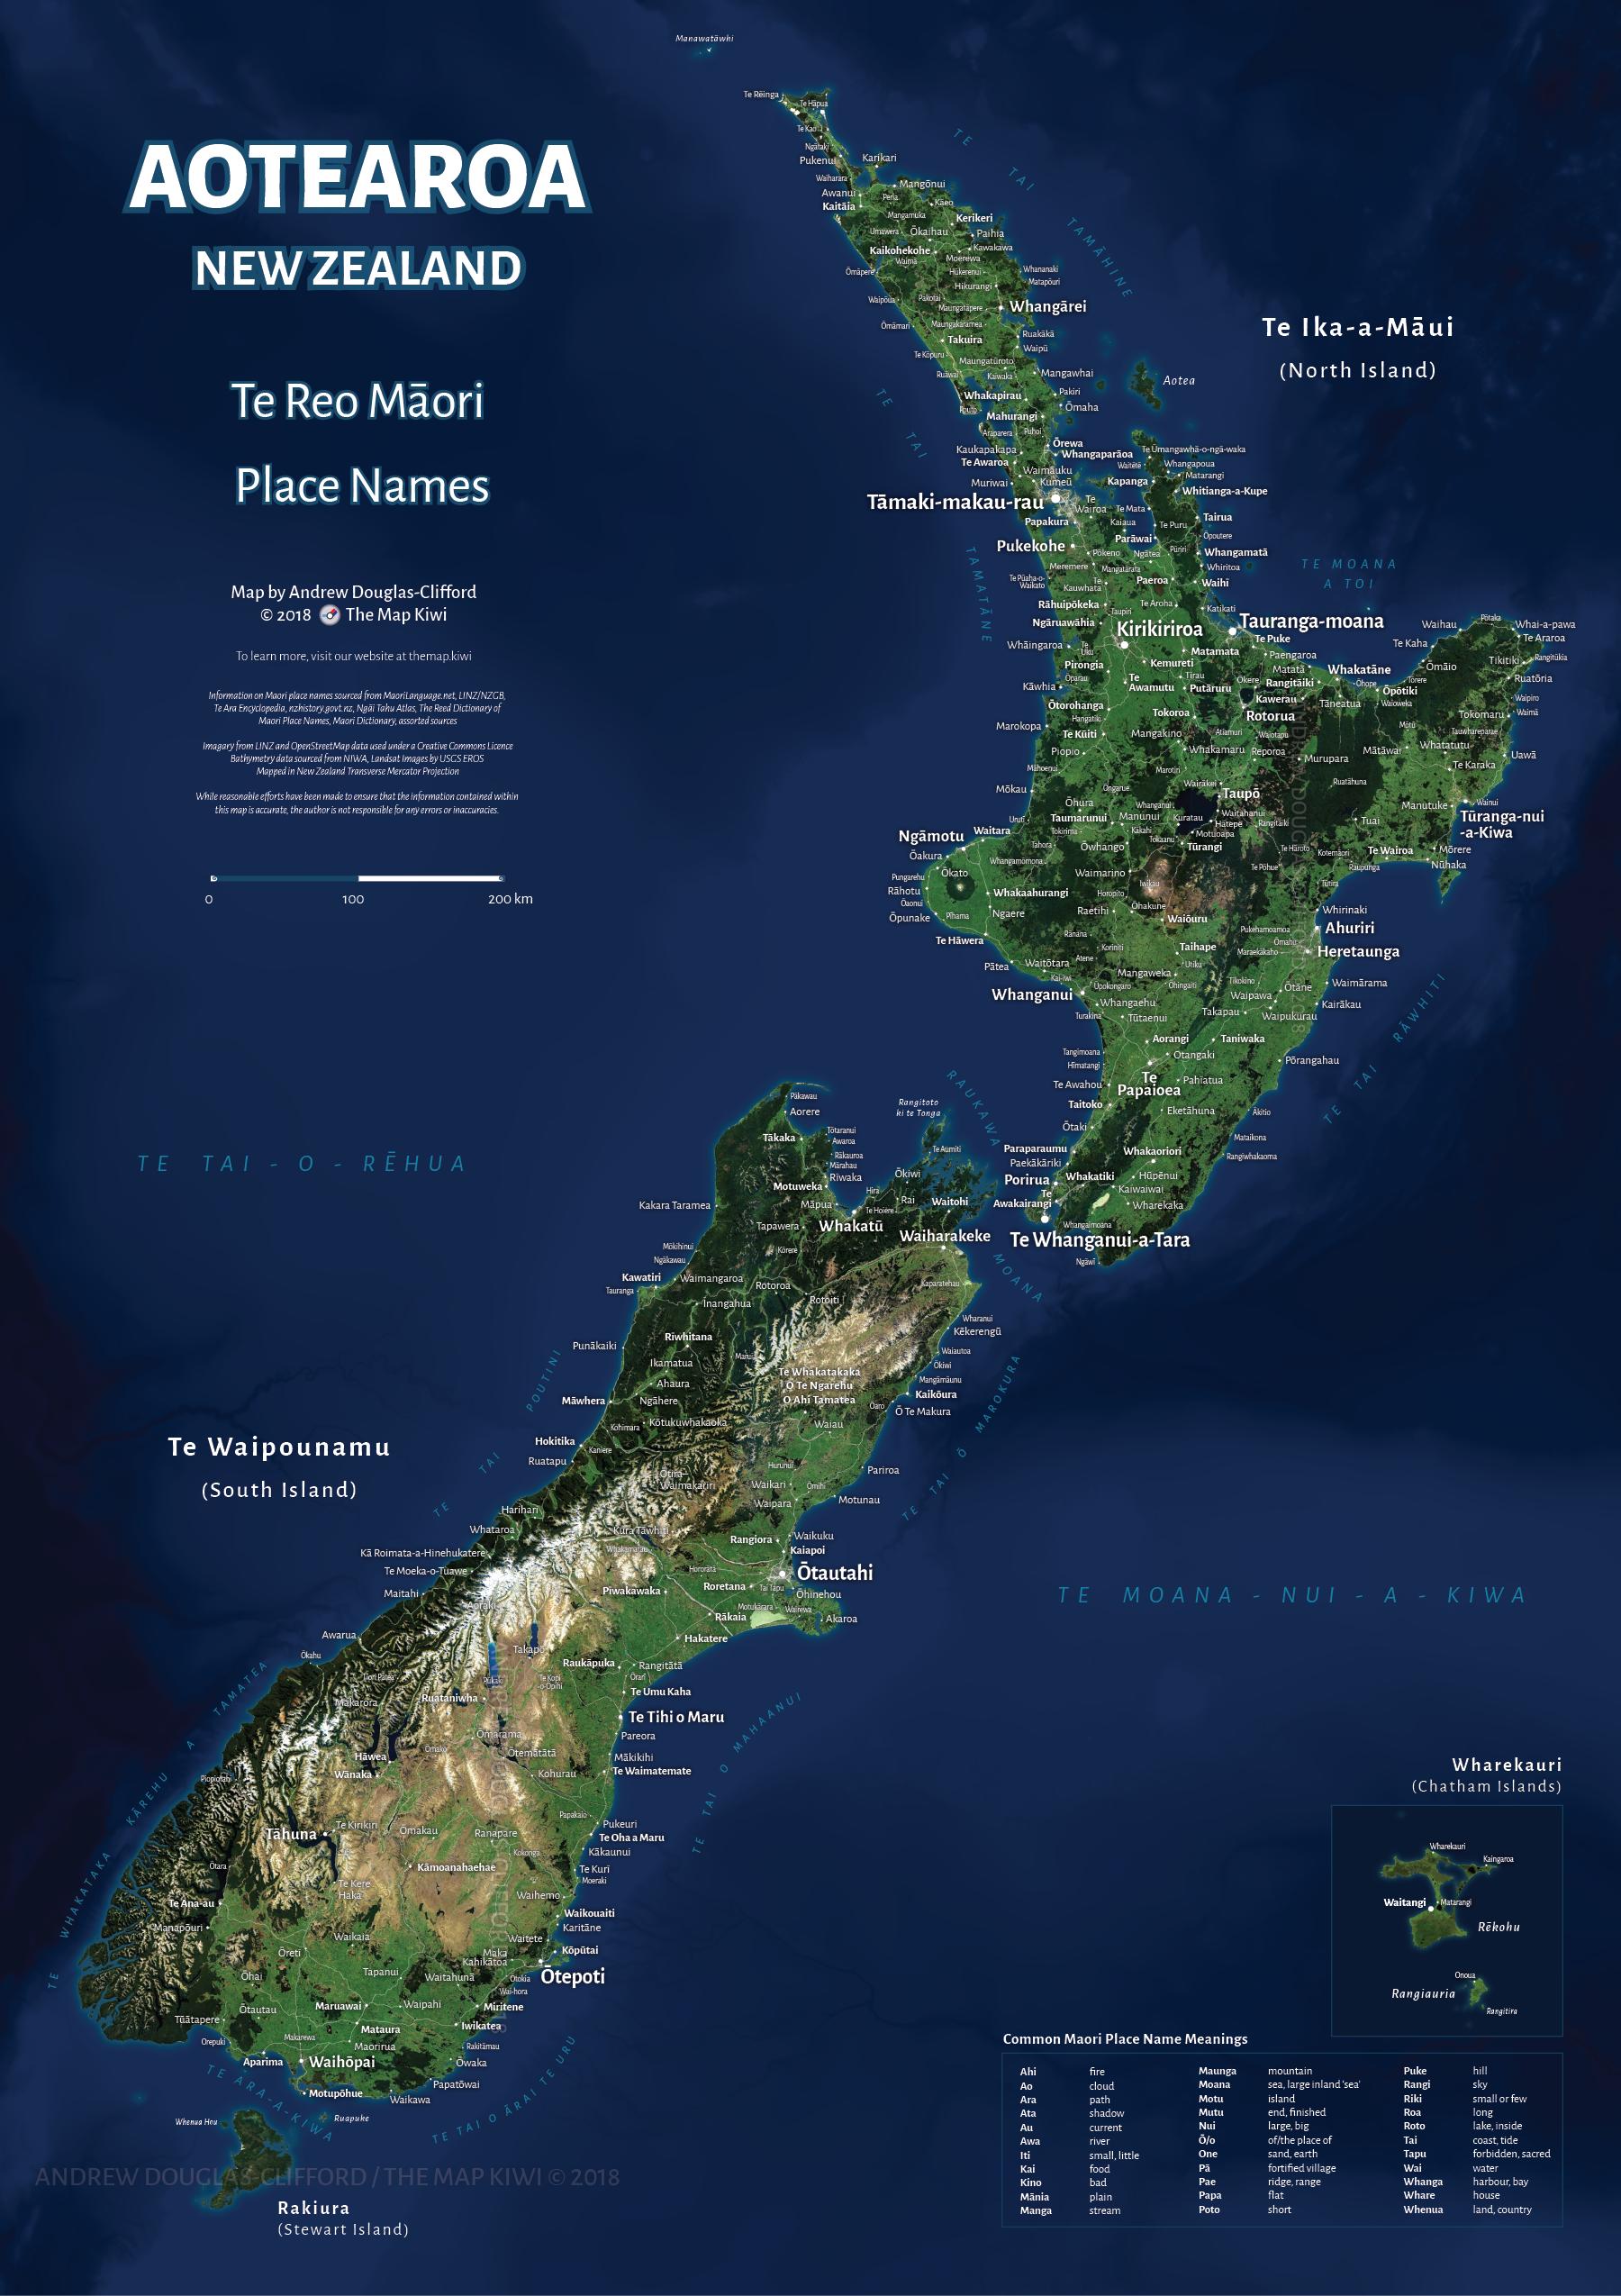 Australia Map Satellite.Maori Place Names Satellite Map Of Aotearoa New Zealand Maps Of